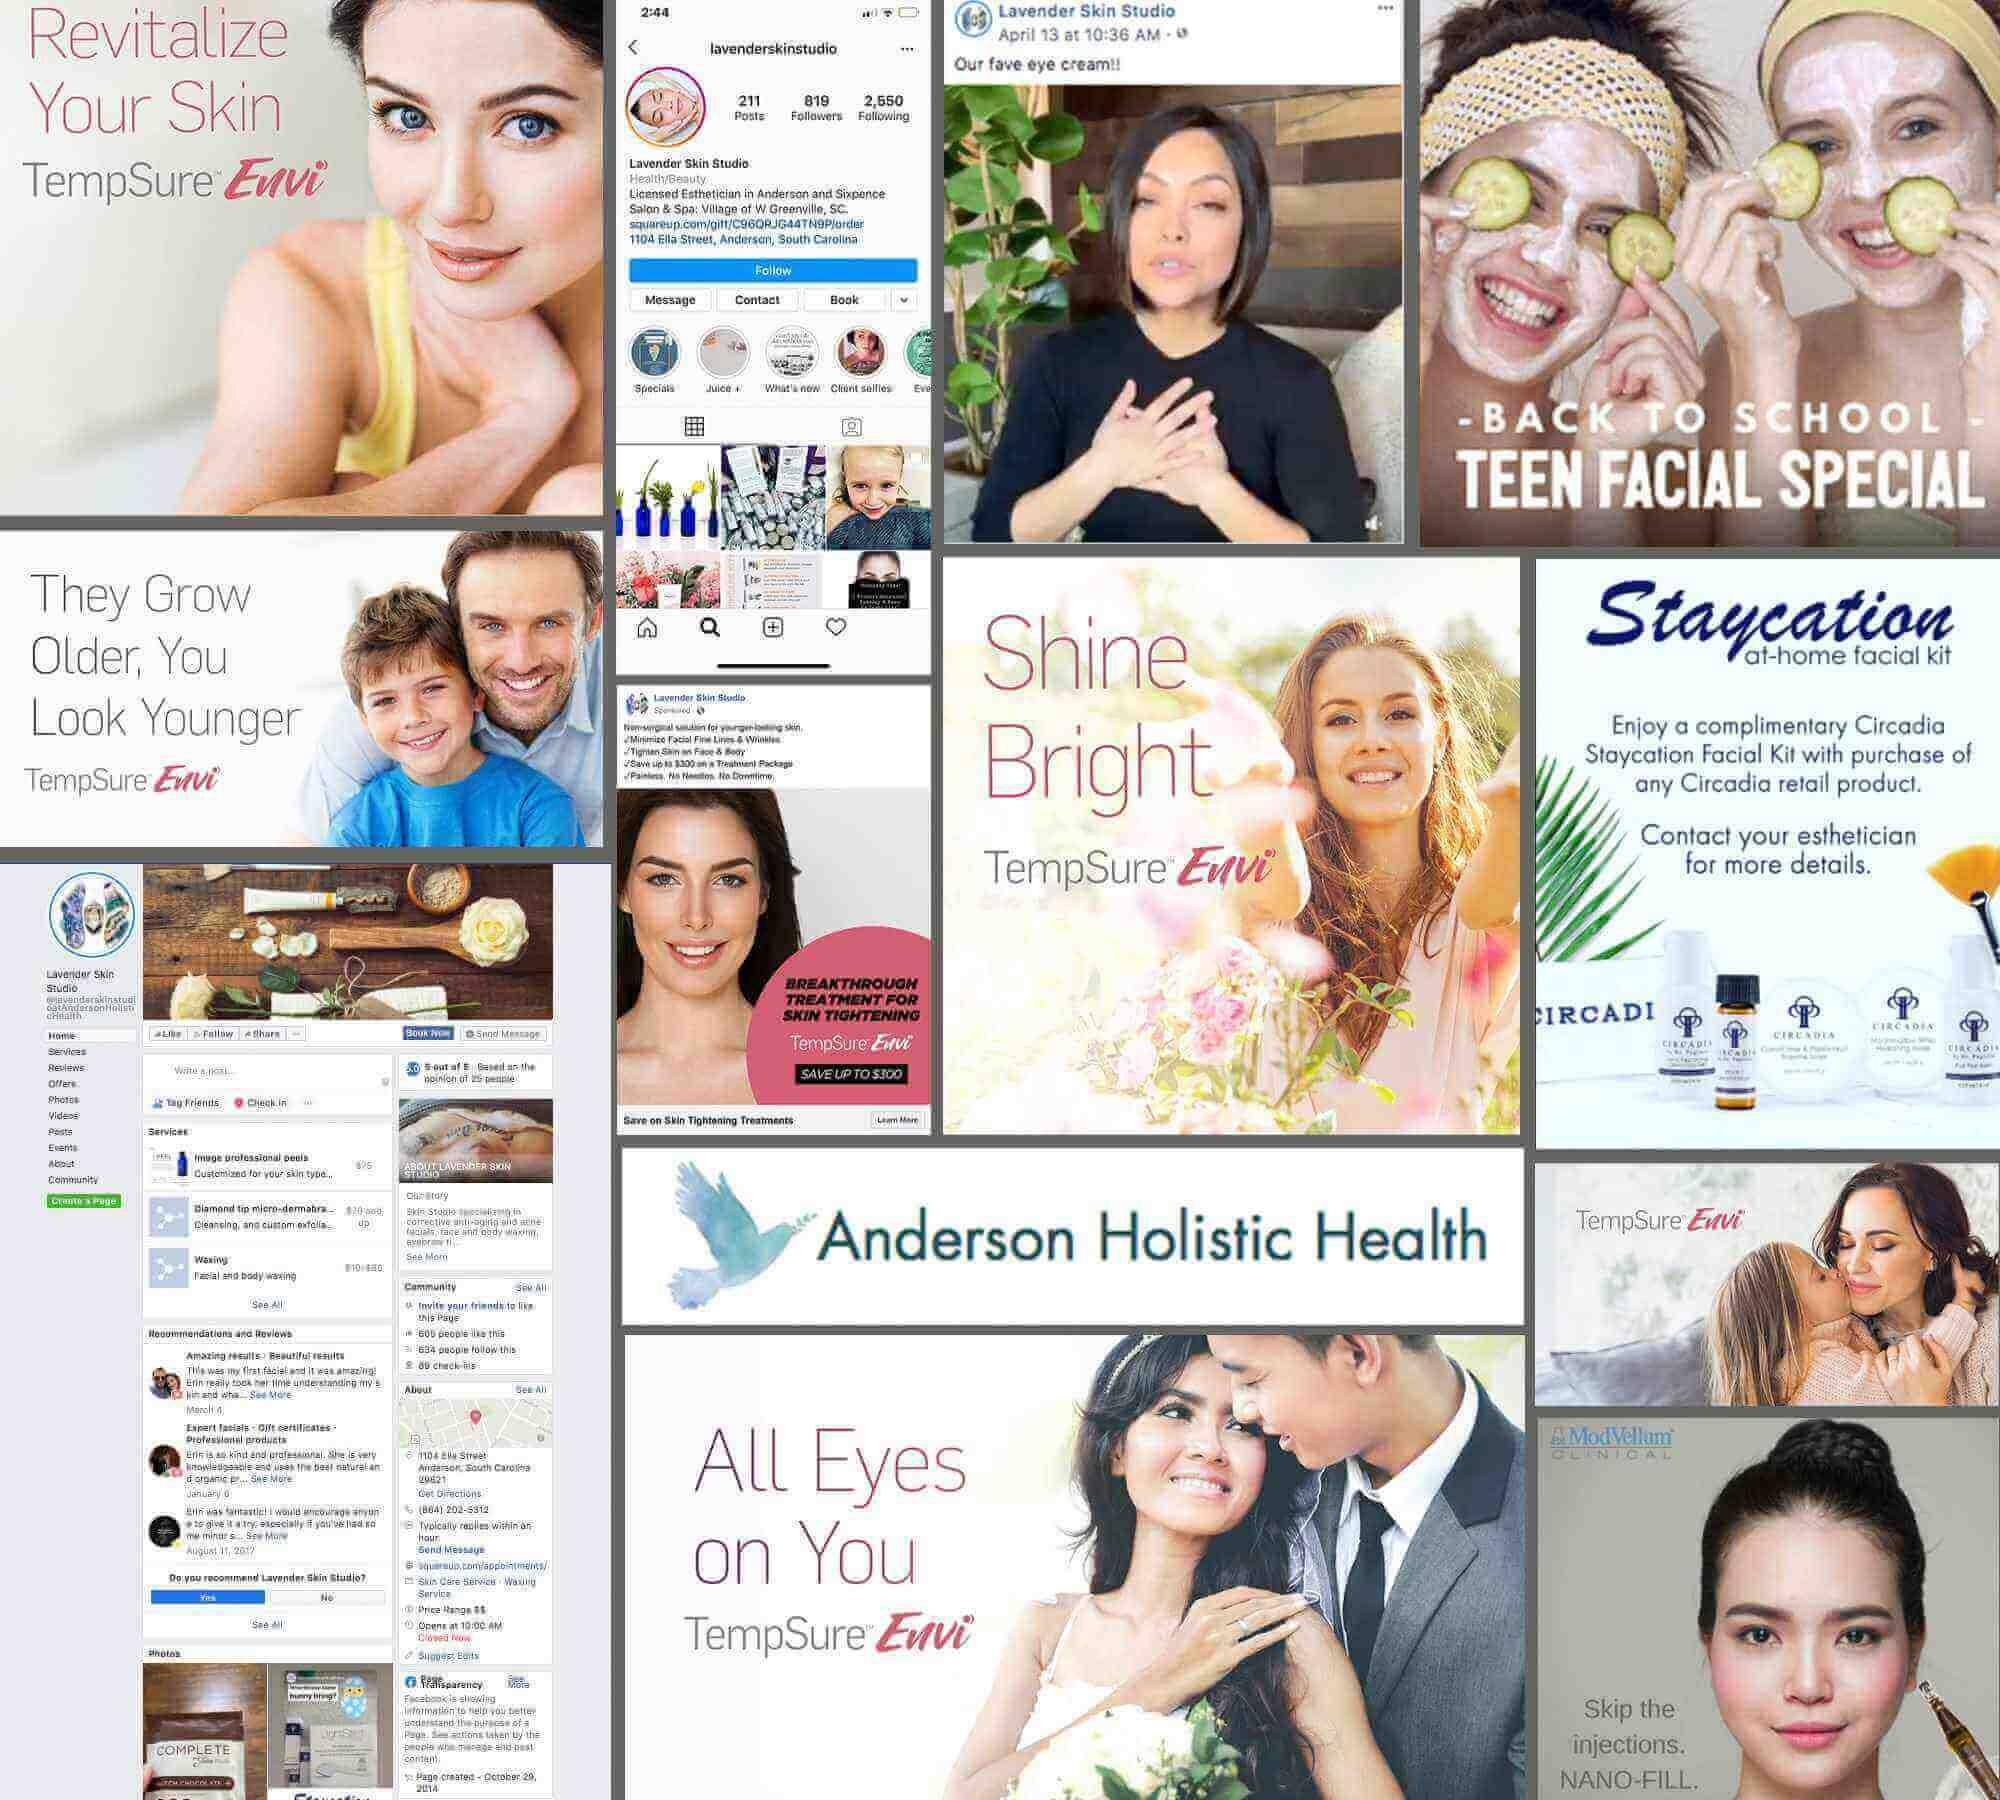 Anderson Holistic Health Social Media Ads